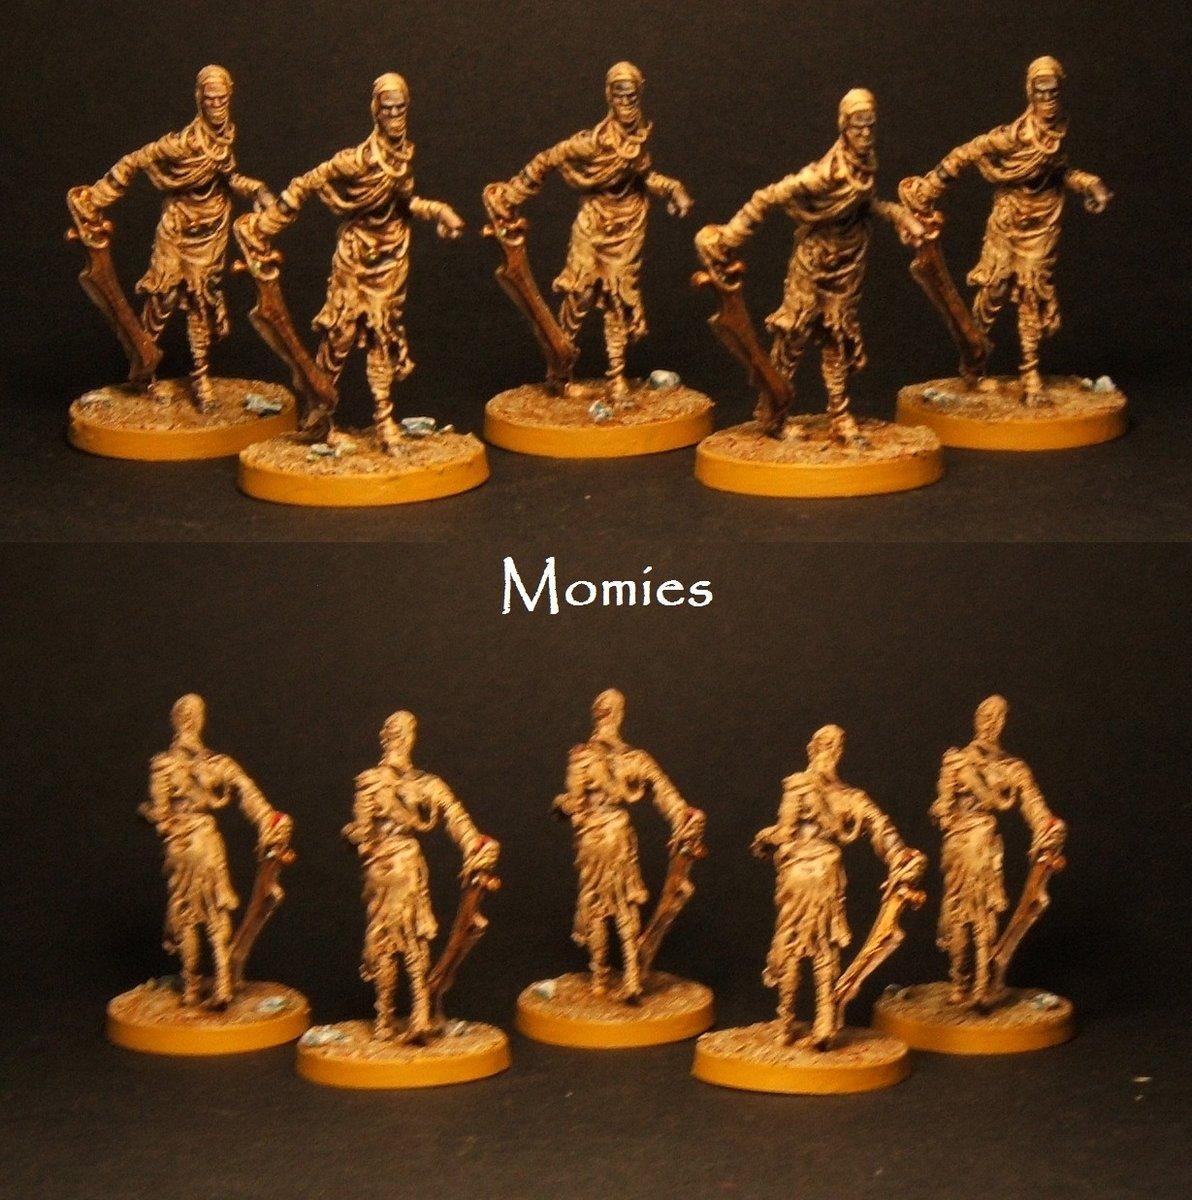 large.momies3.jpg.c1c6887b186f71b29d7c7fa8ec2adb25.jpg